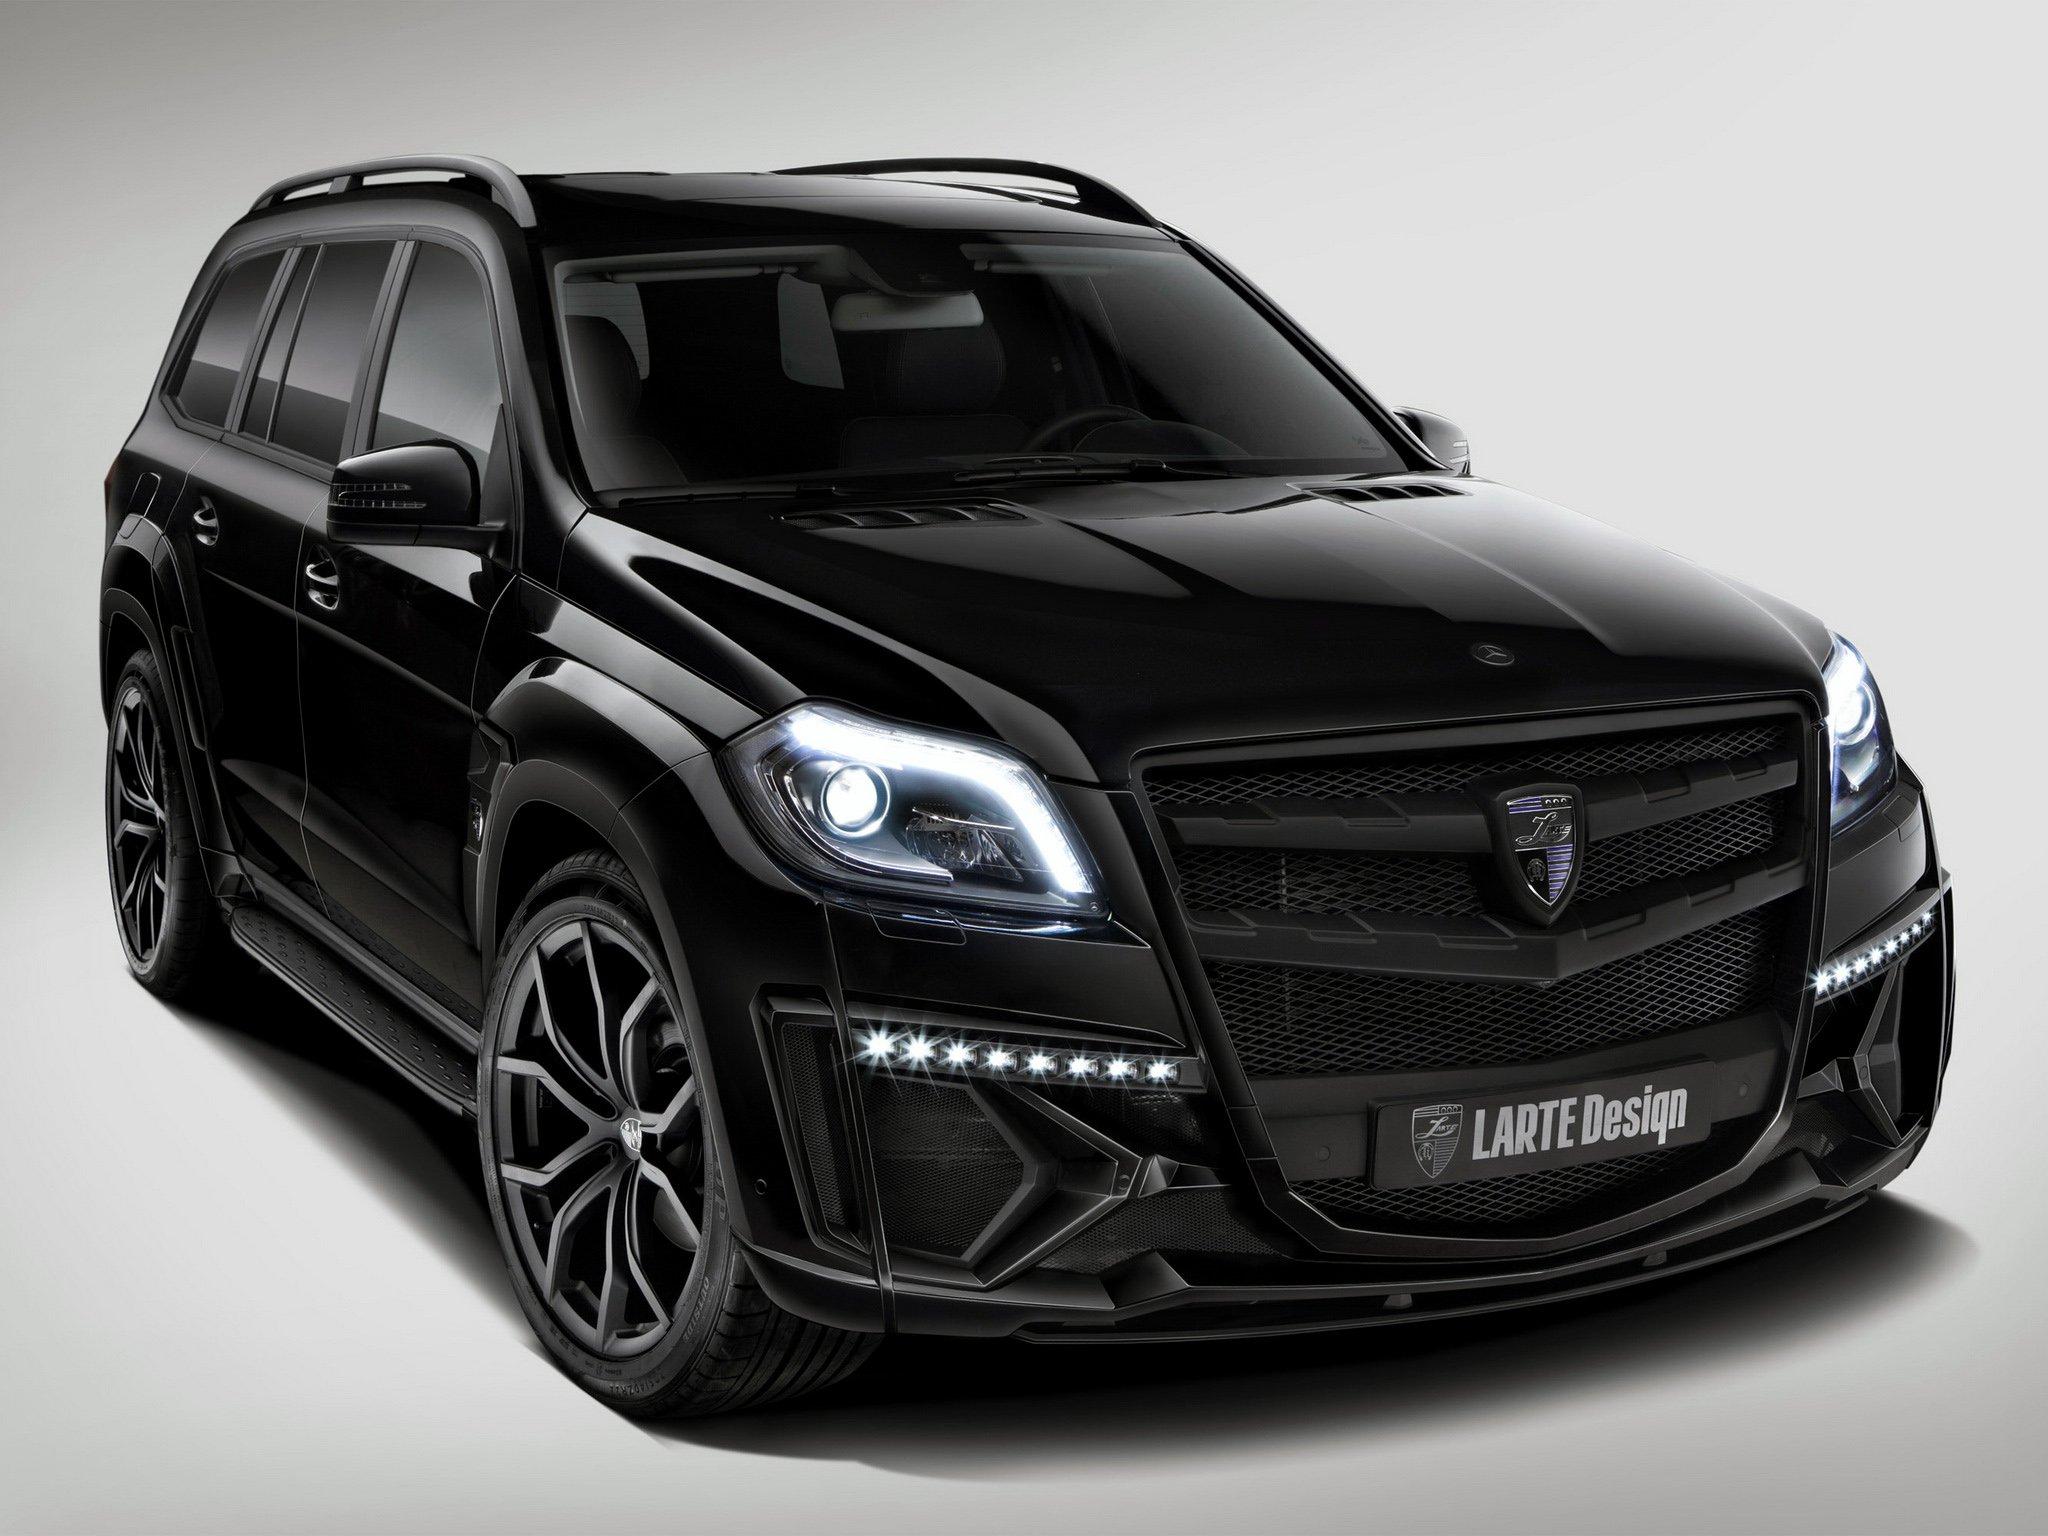 2014 larte design mercedes benz g l black crystal x166 tuning suv wallpaper 2048x1536 451720 wallpaperup - Mercedes Benz Suv 2014 White